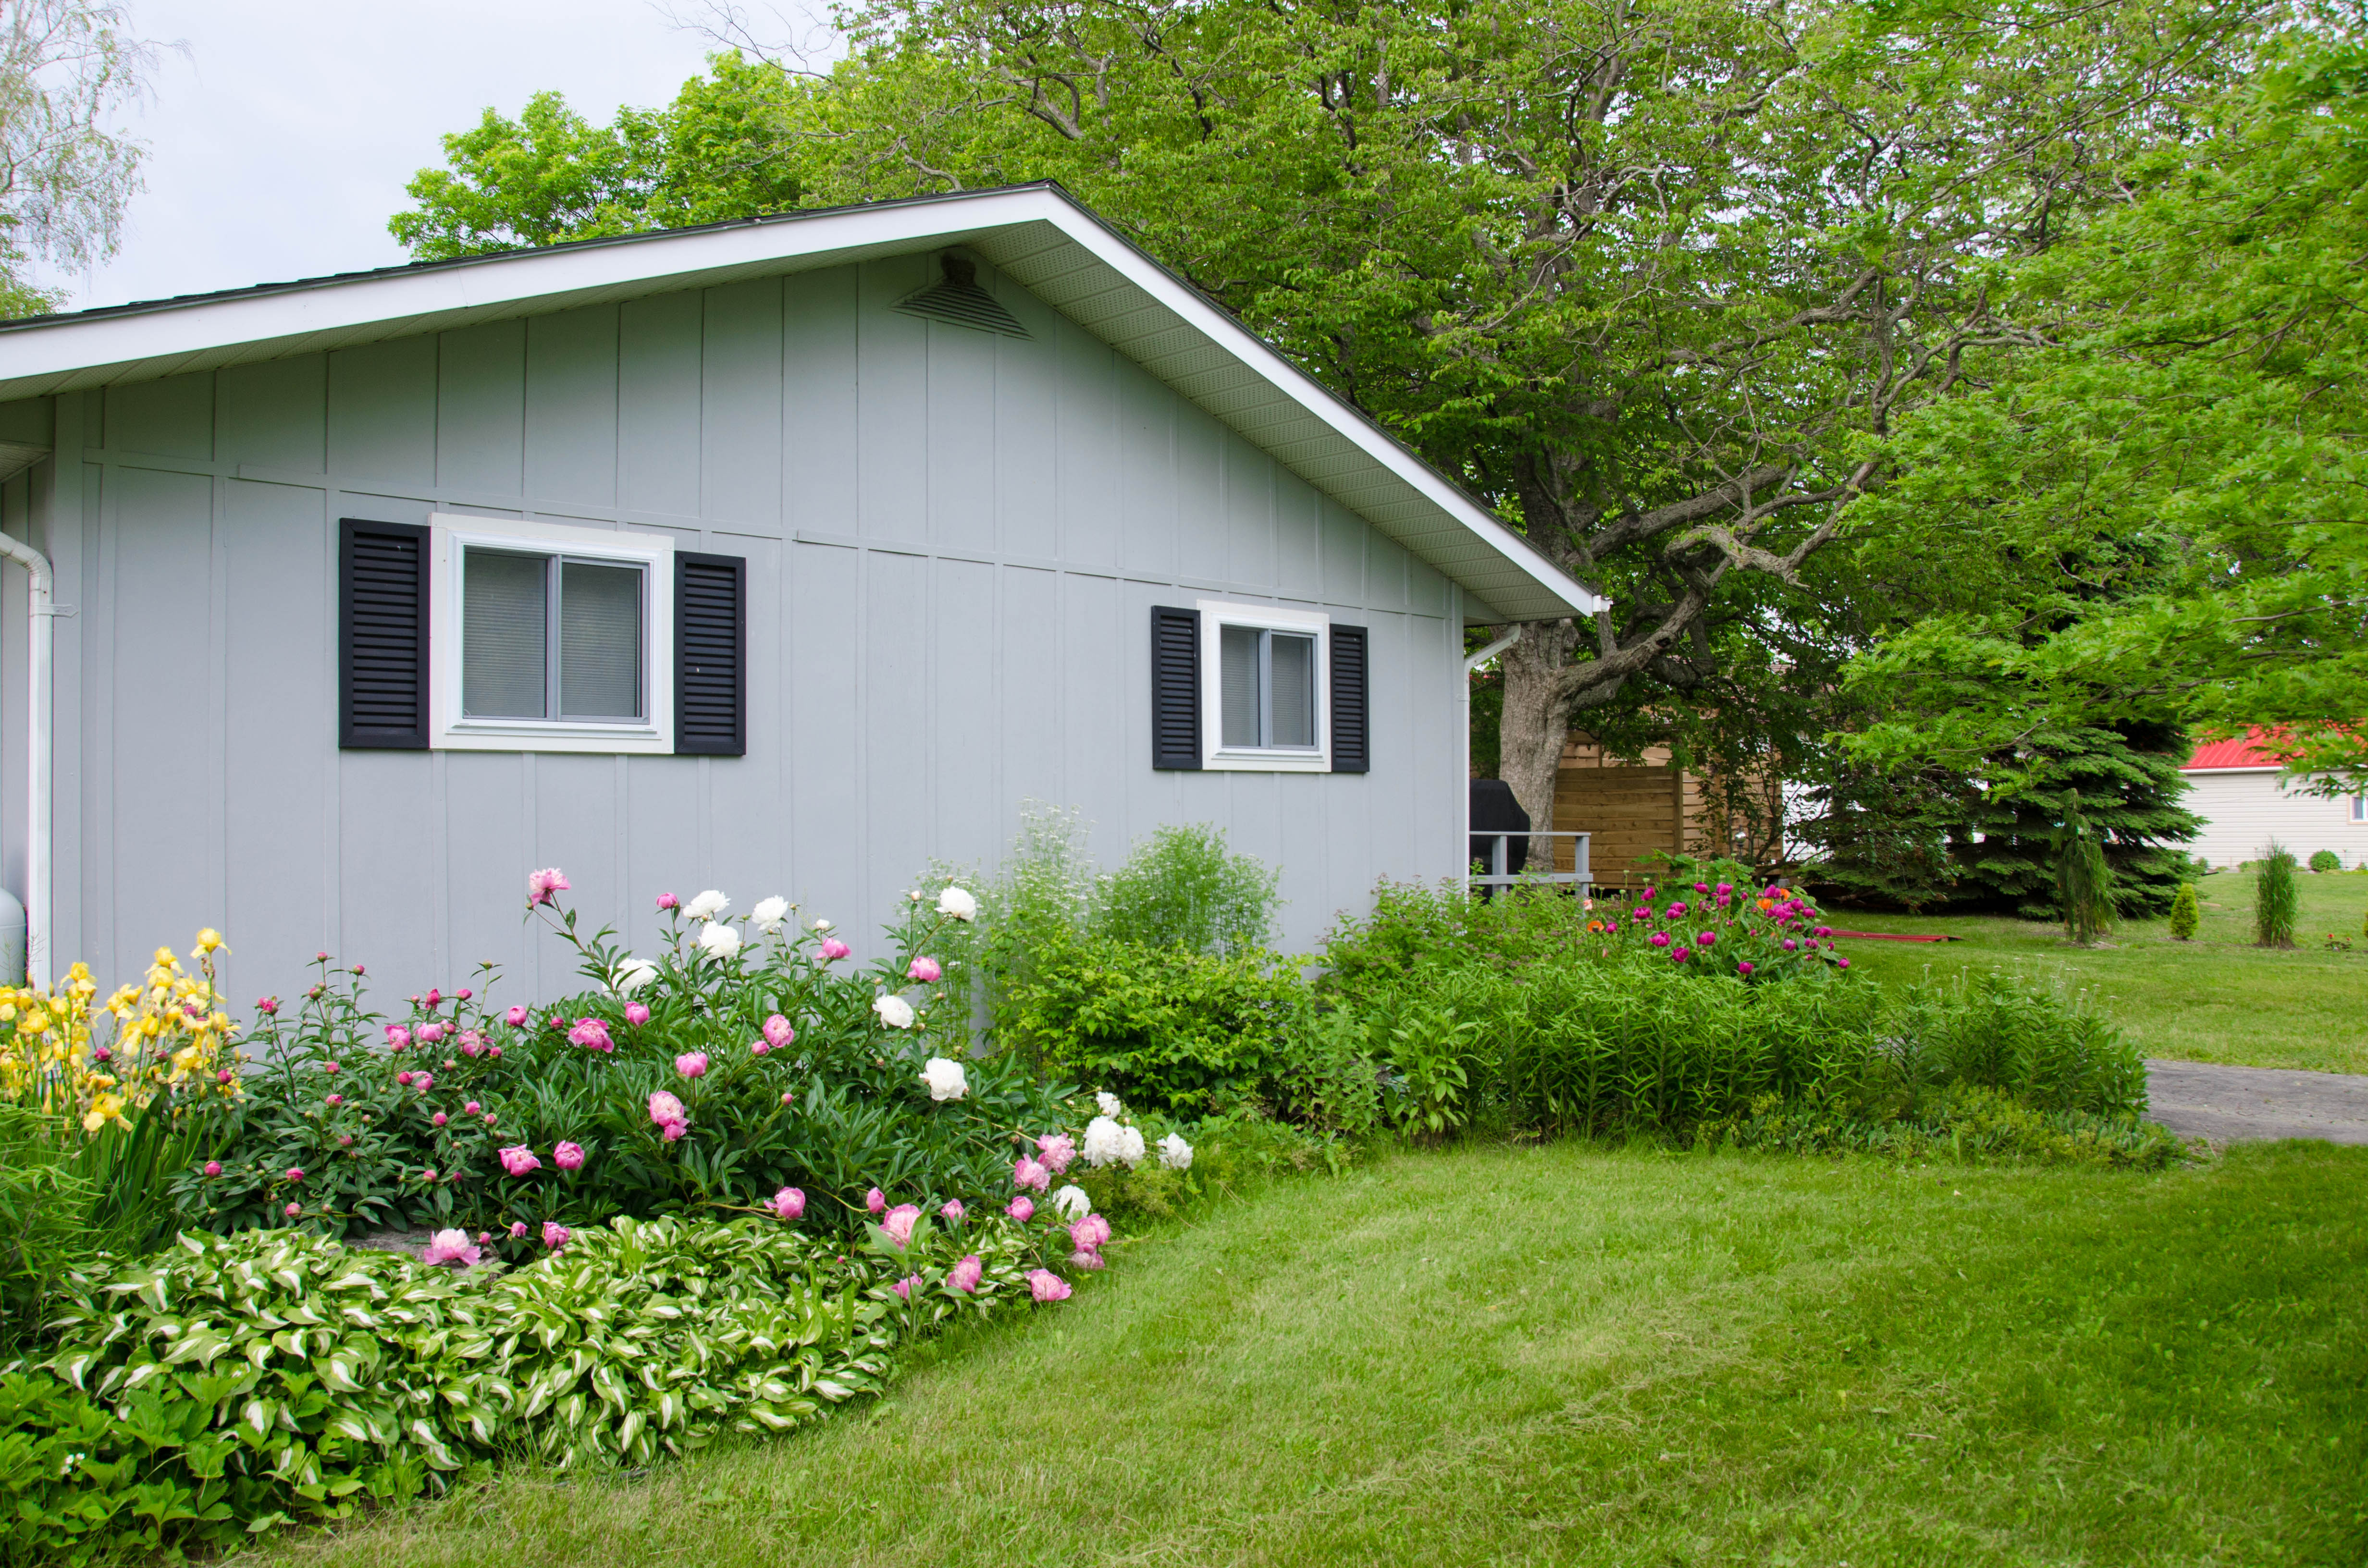 Prince edward county cottage rental garden